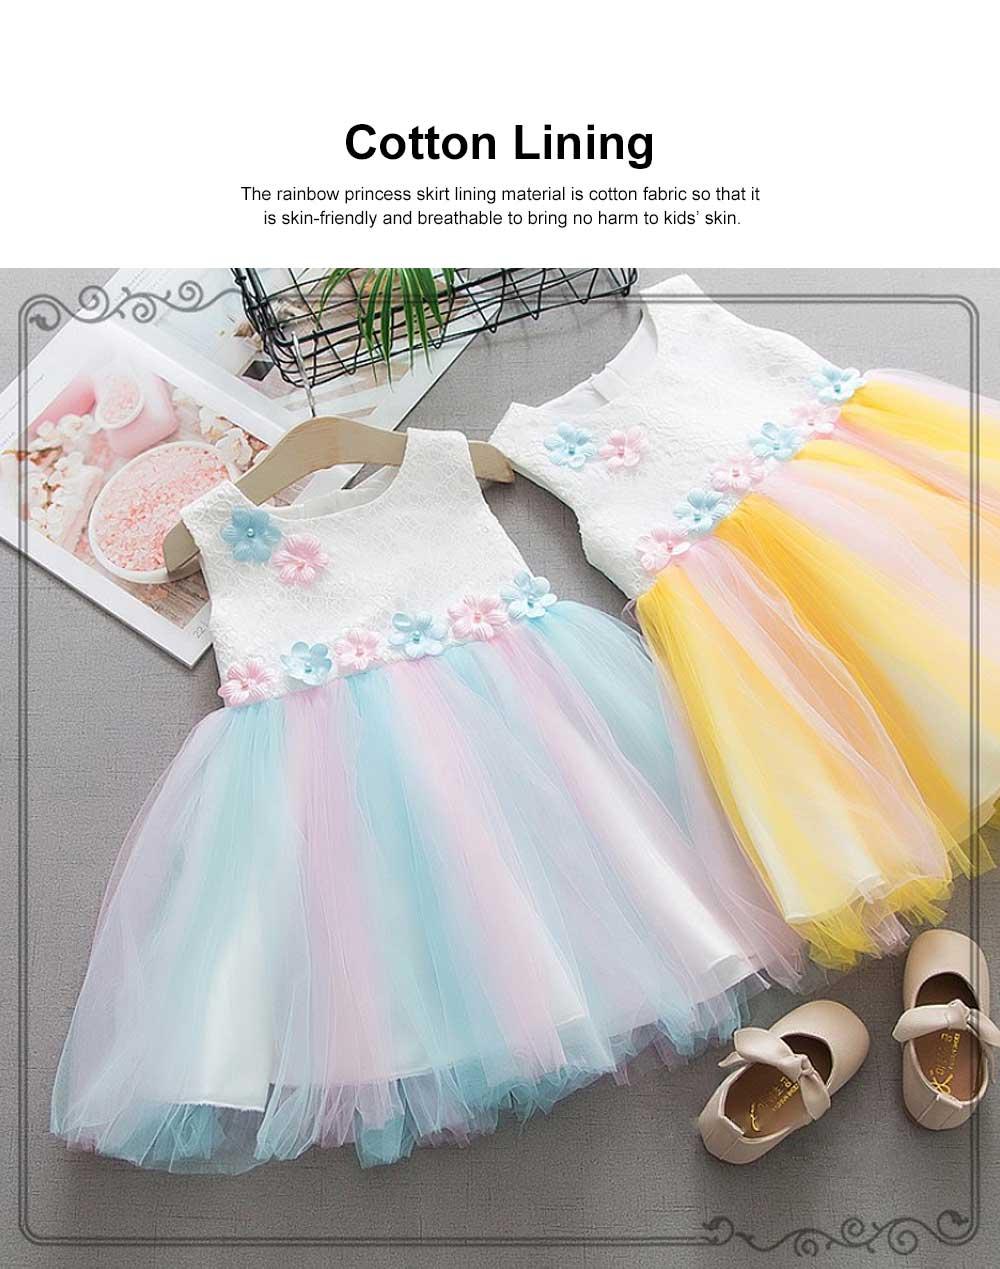 Rainbow Color Princess Skirt for Girl Kids, Summer Wear Korean Style Sleeveless One-piece Dress Princess Skirt for 1-3 Years 1